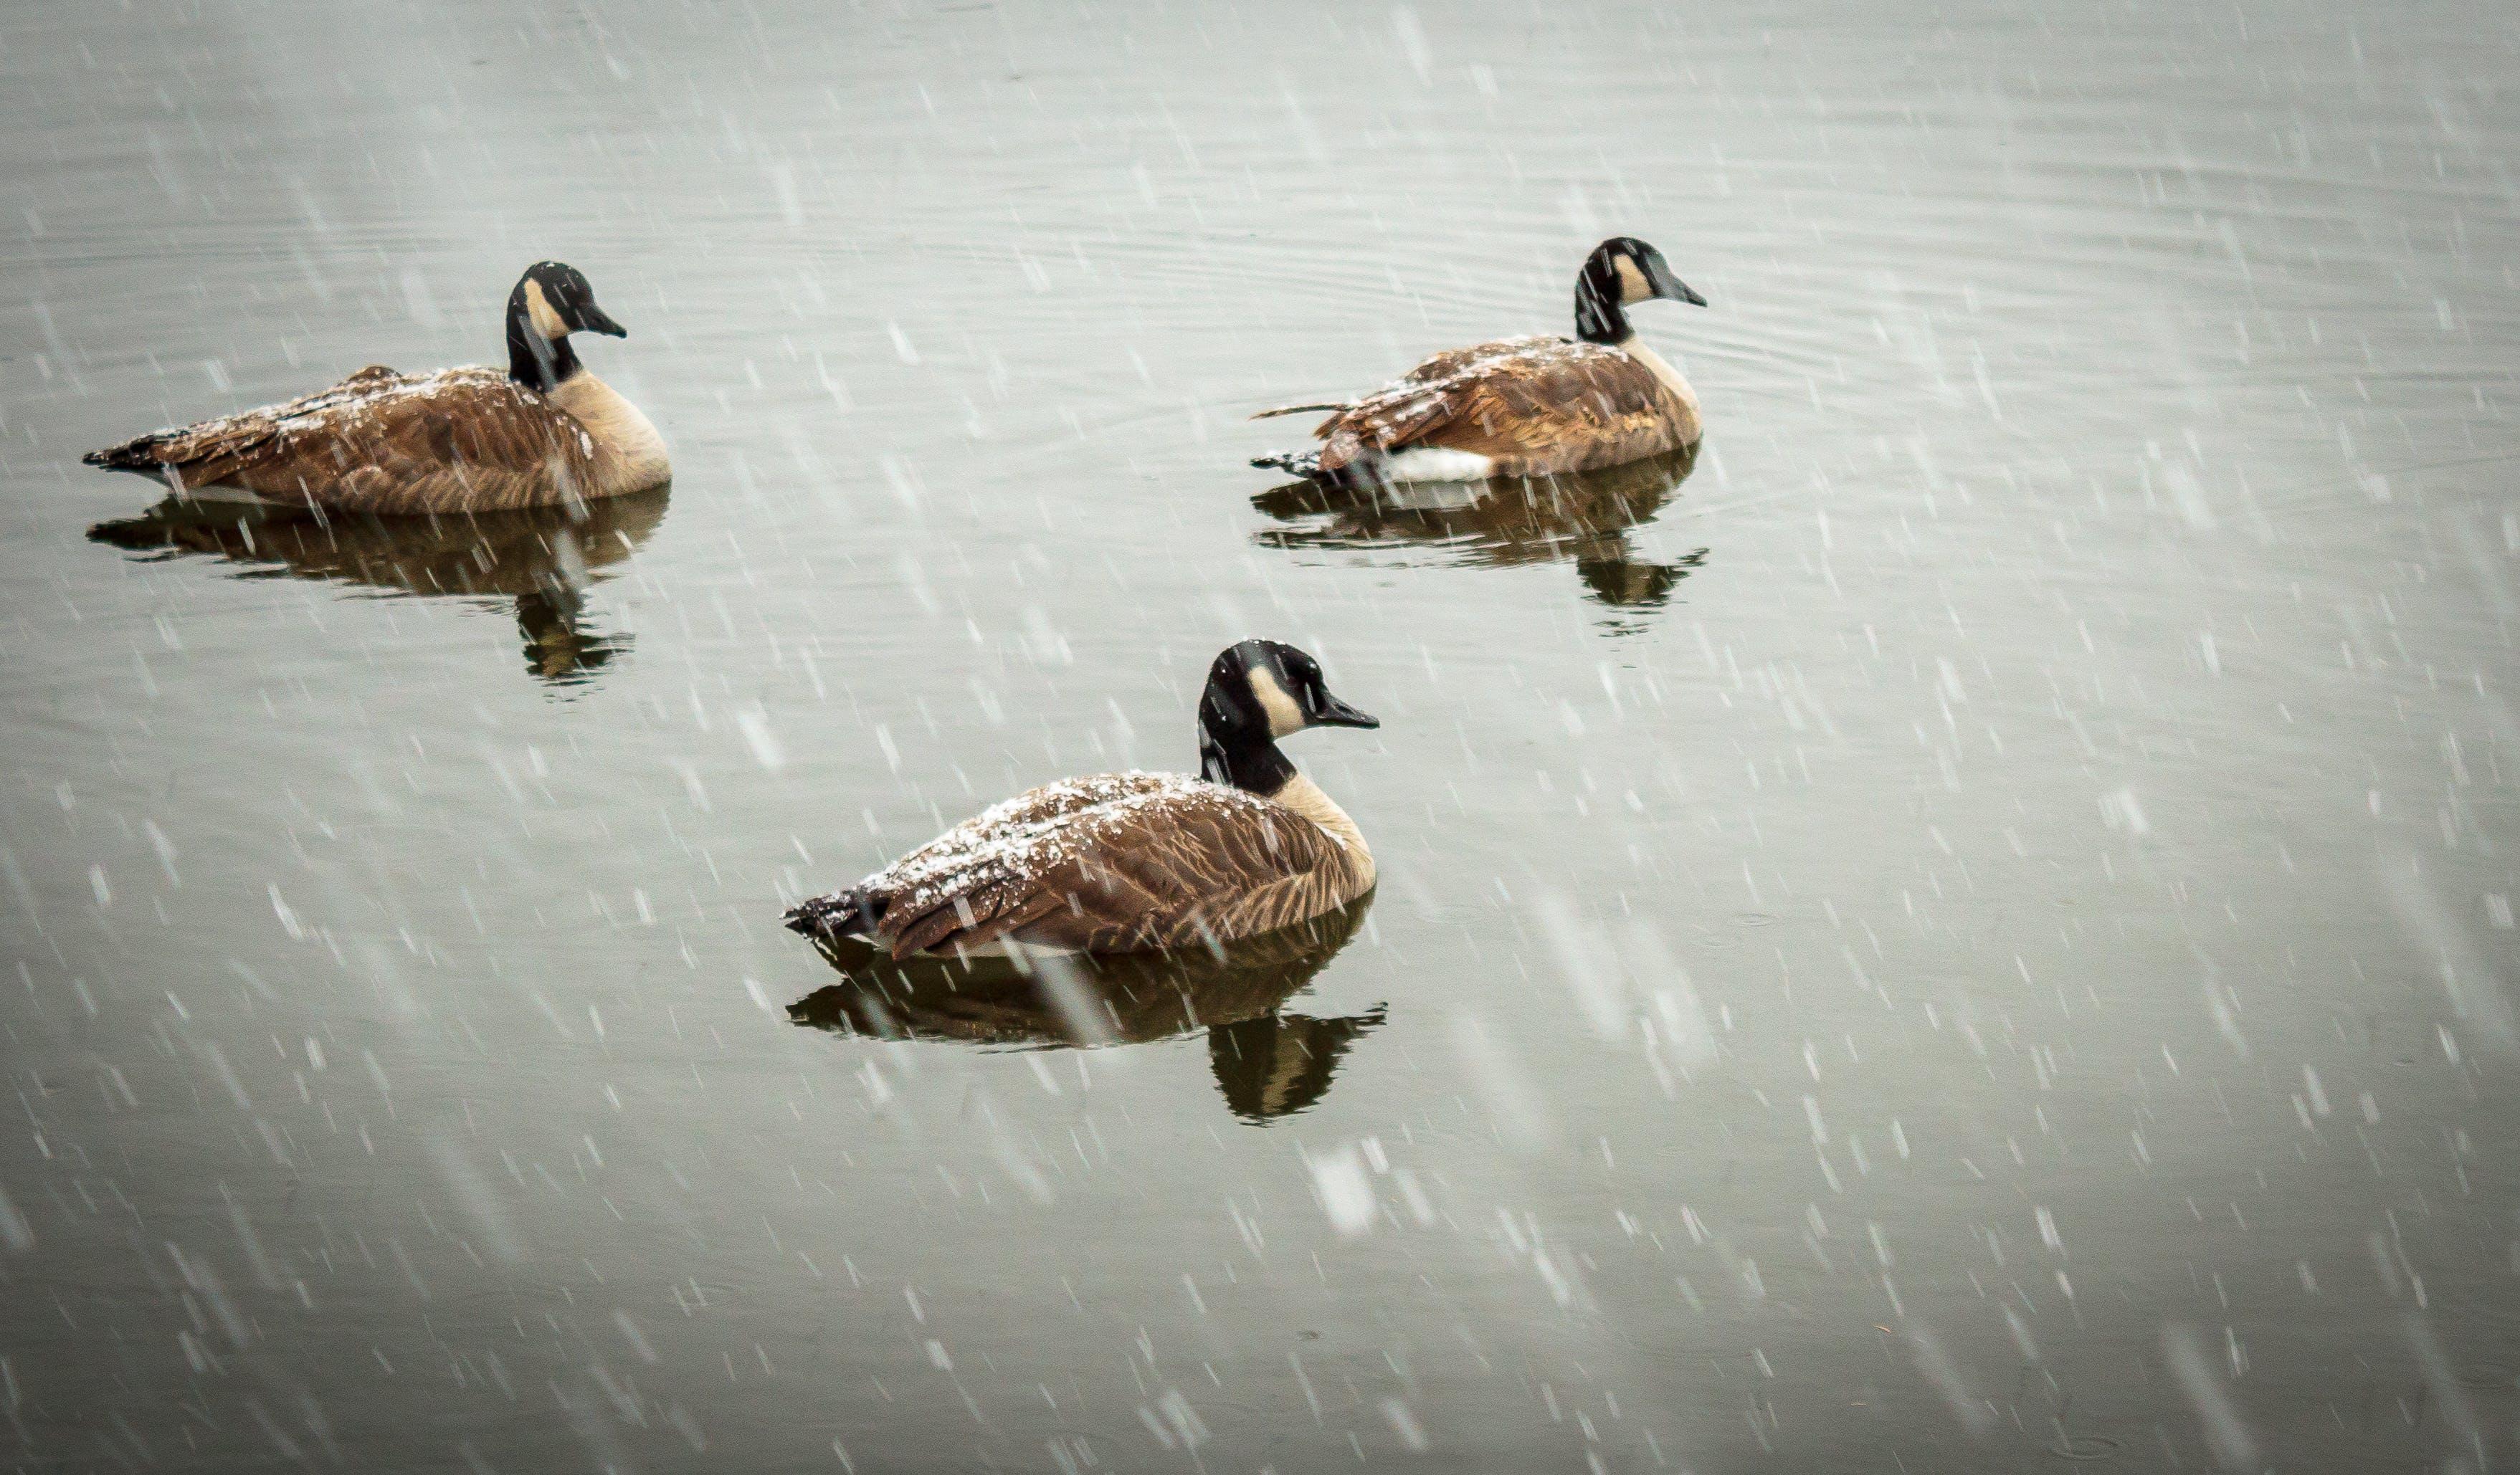 Free stock photo of animal, aquatic animal, beautiful, city park